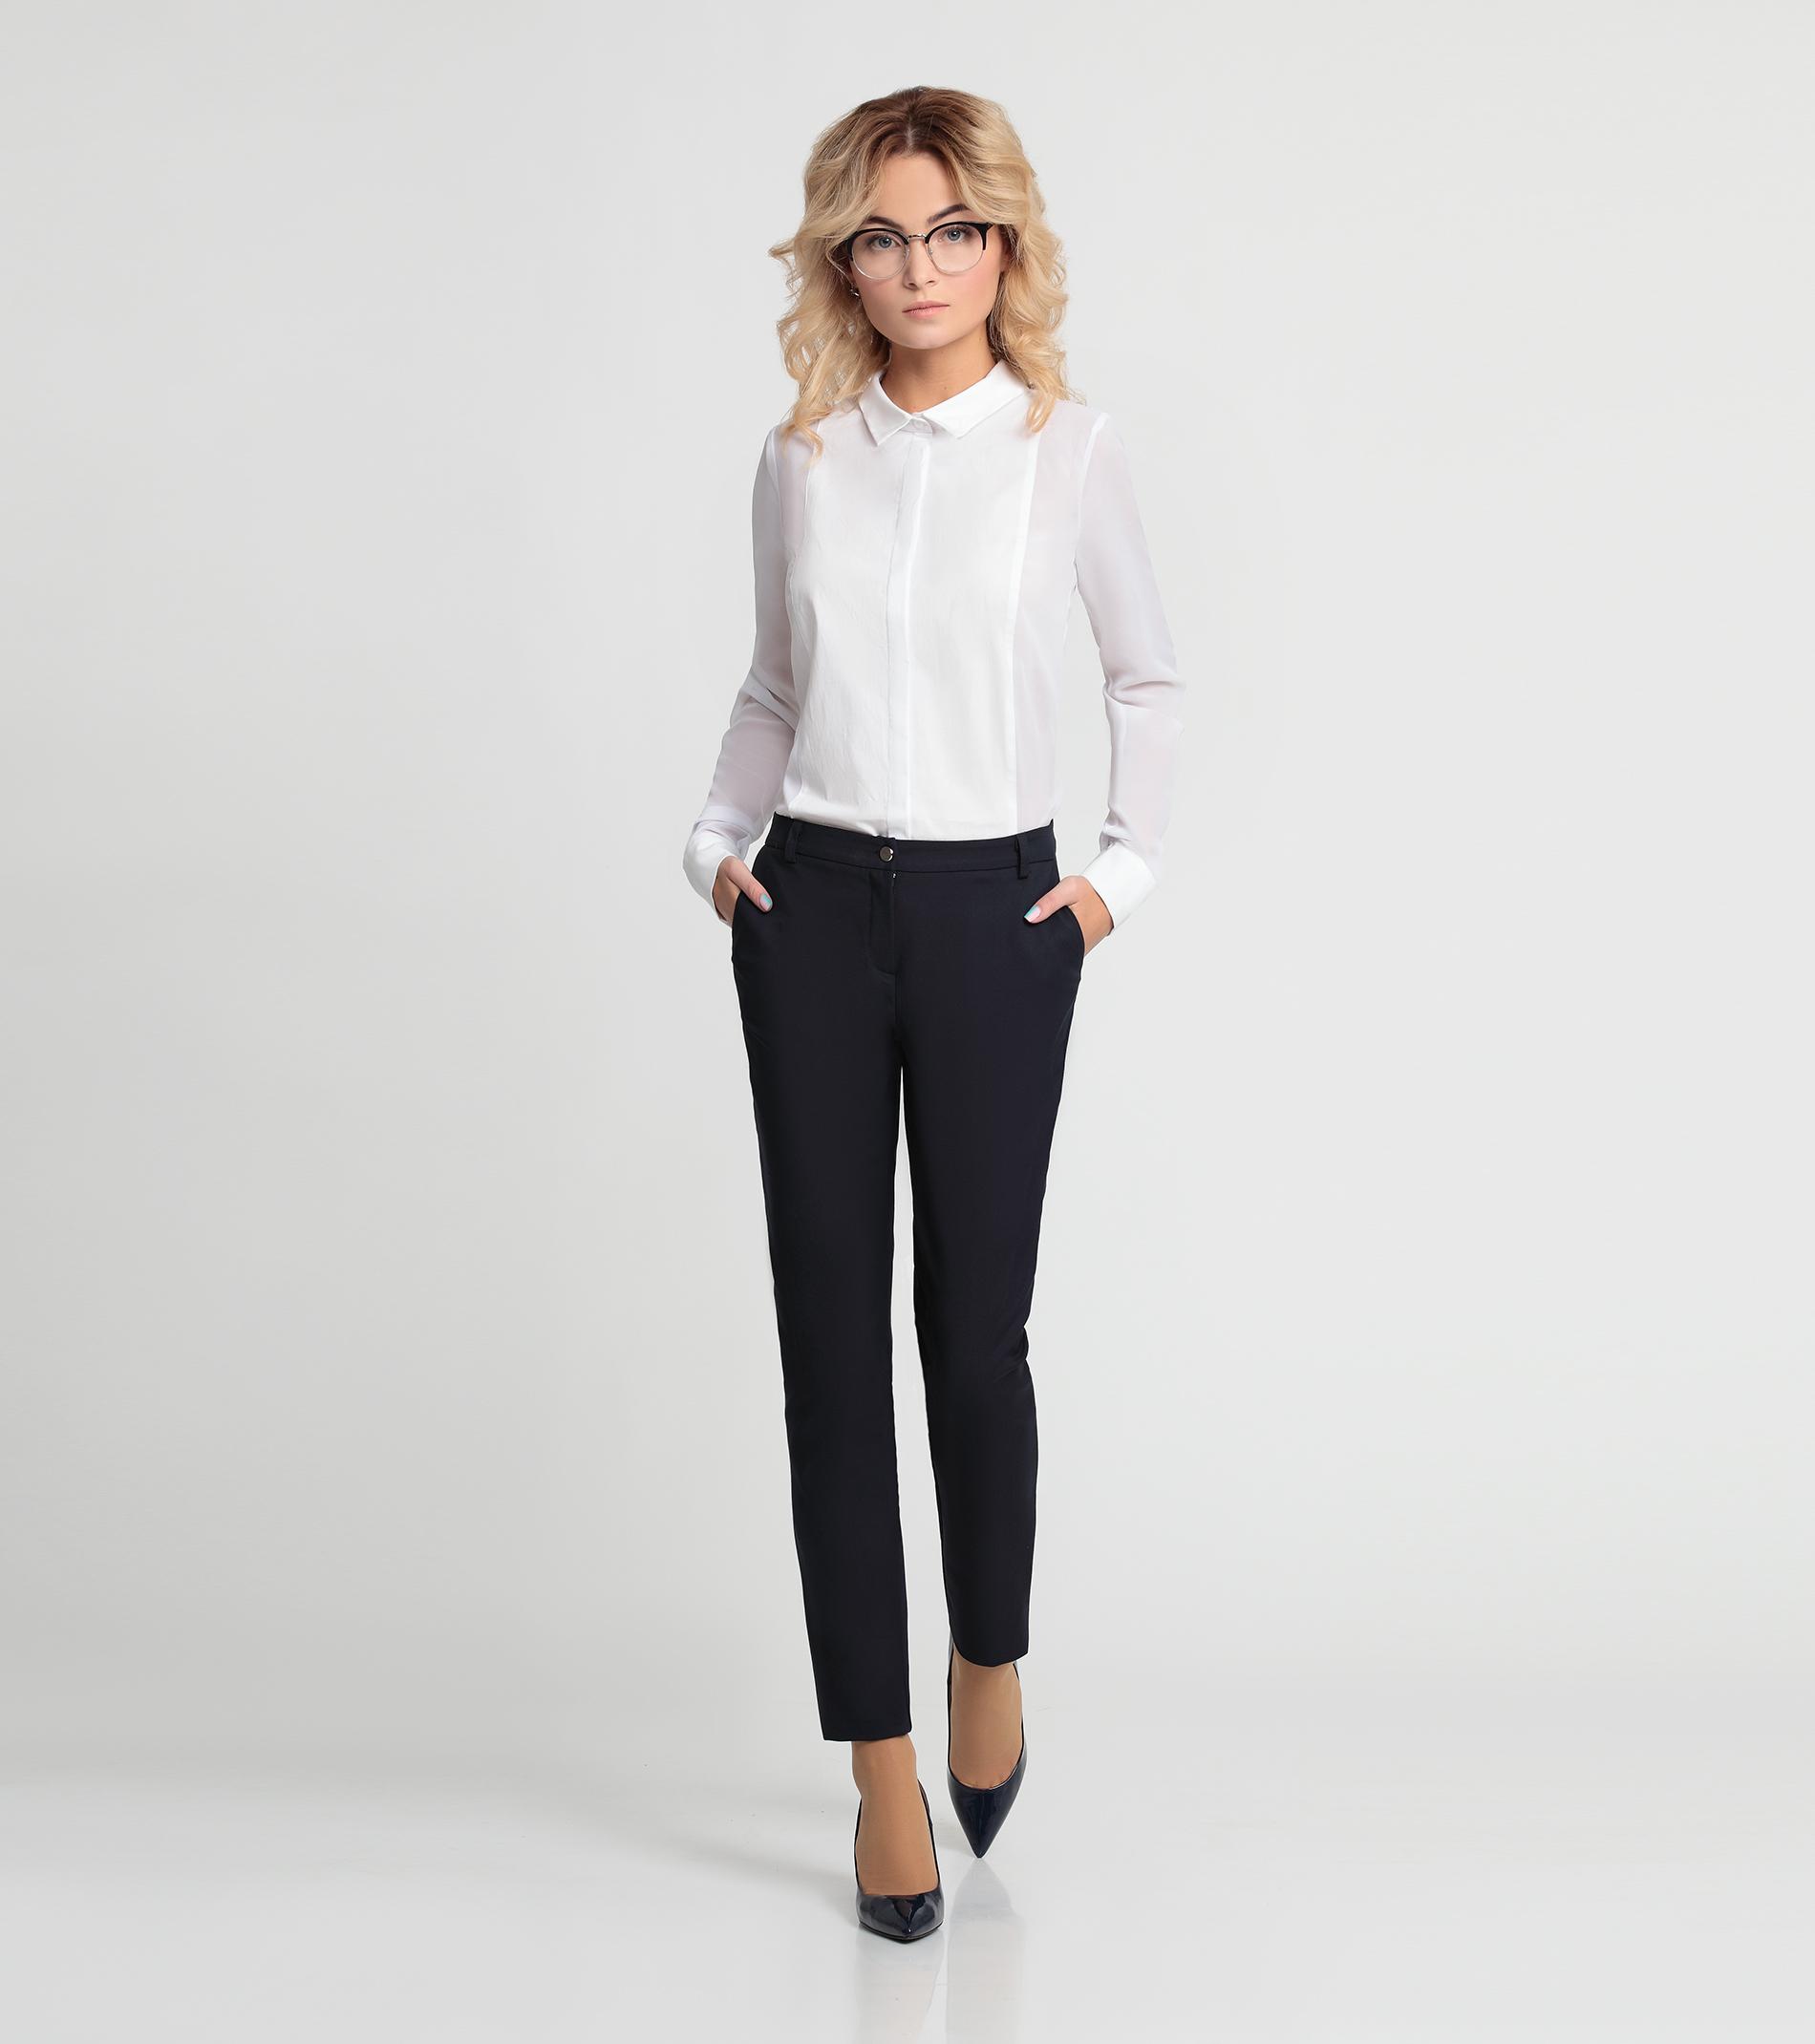 Женские брюки от производителя